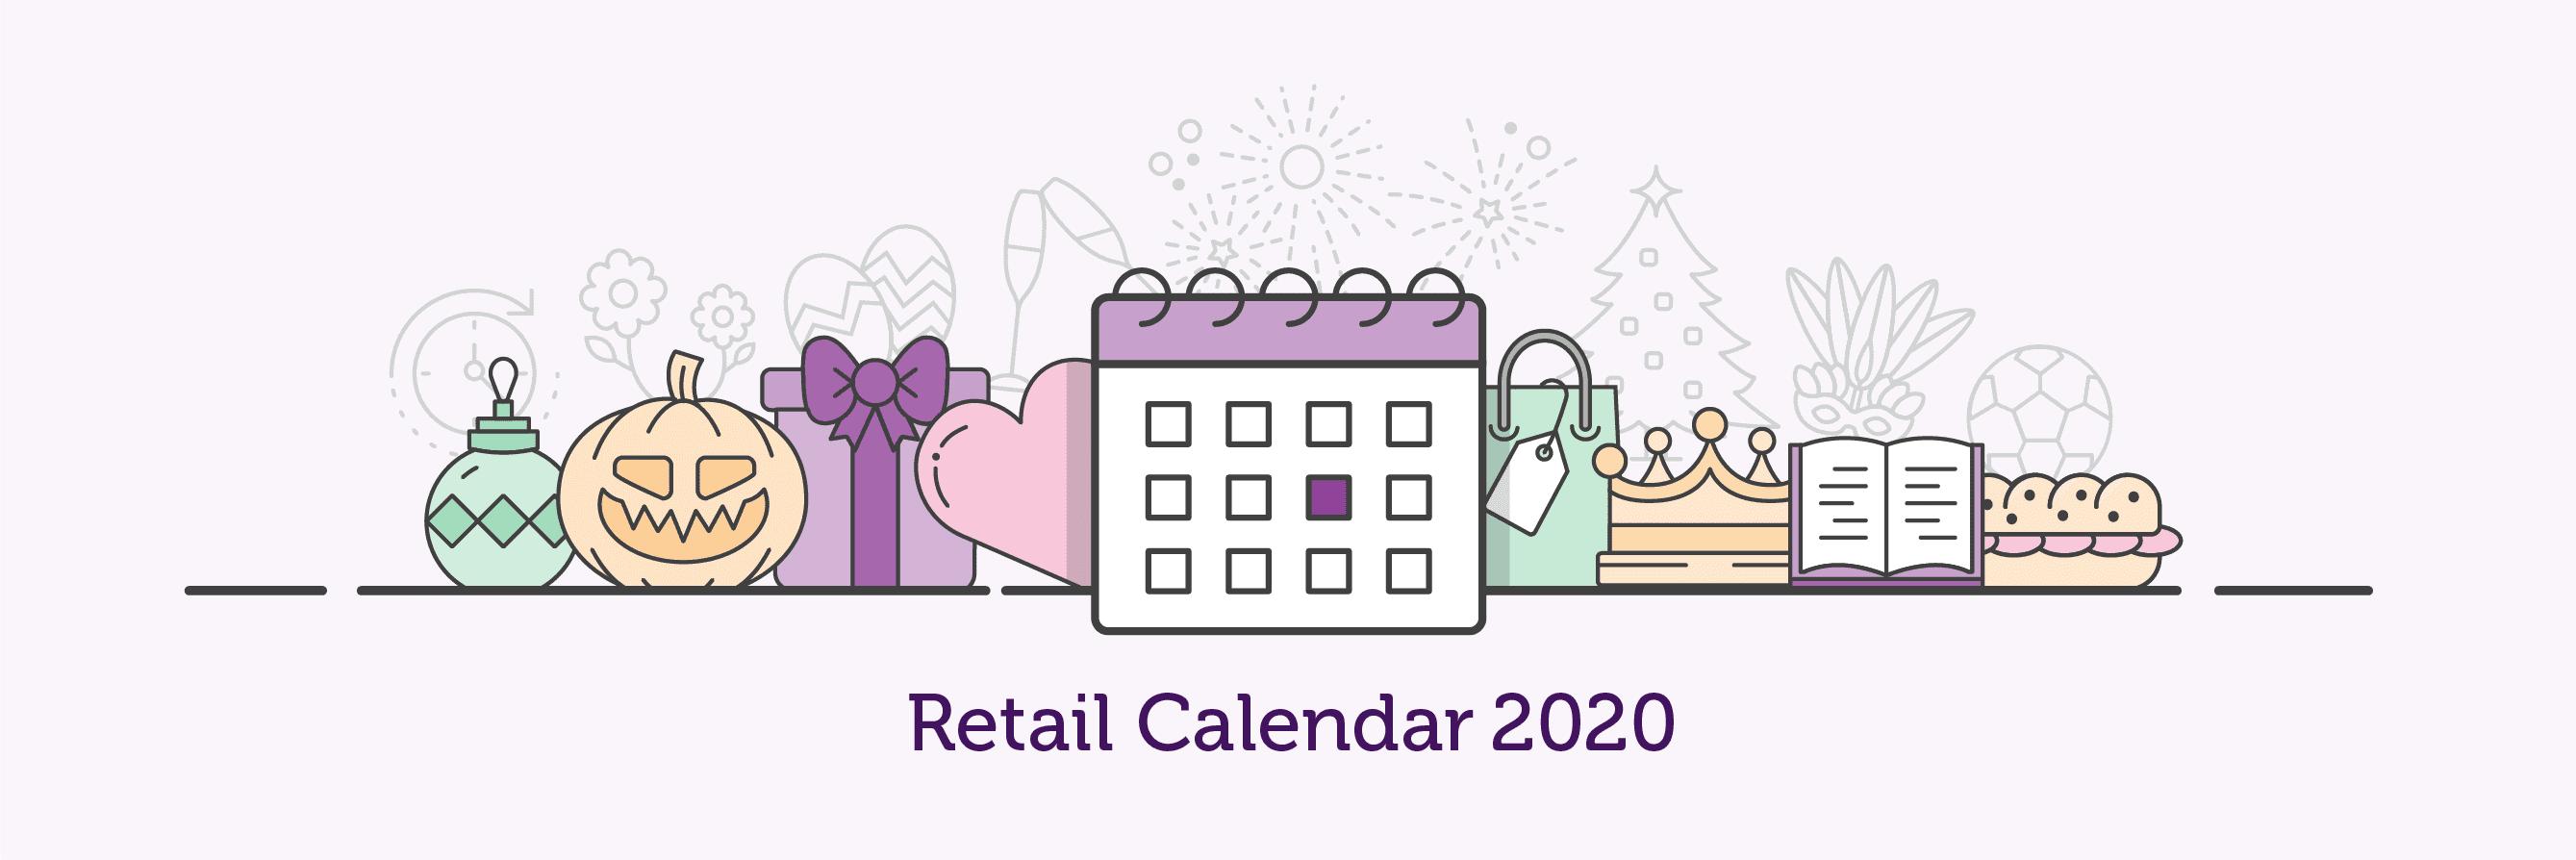 Retail Calendar 2020 banner image